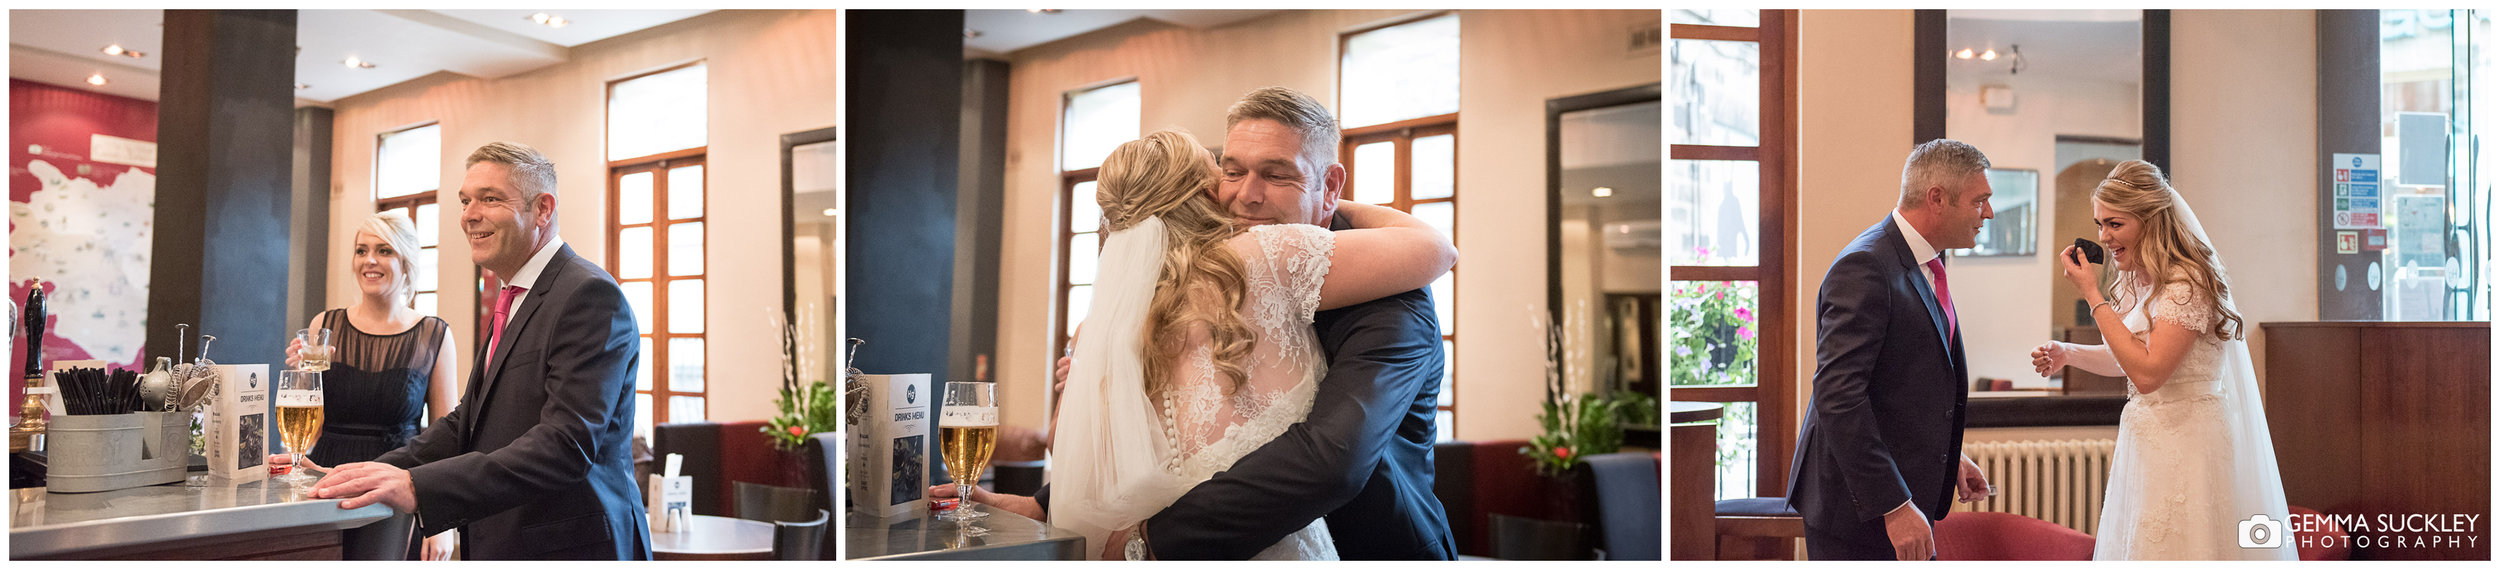 the-yorkshire-harrohate-weddings.jpg